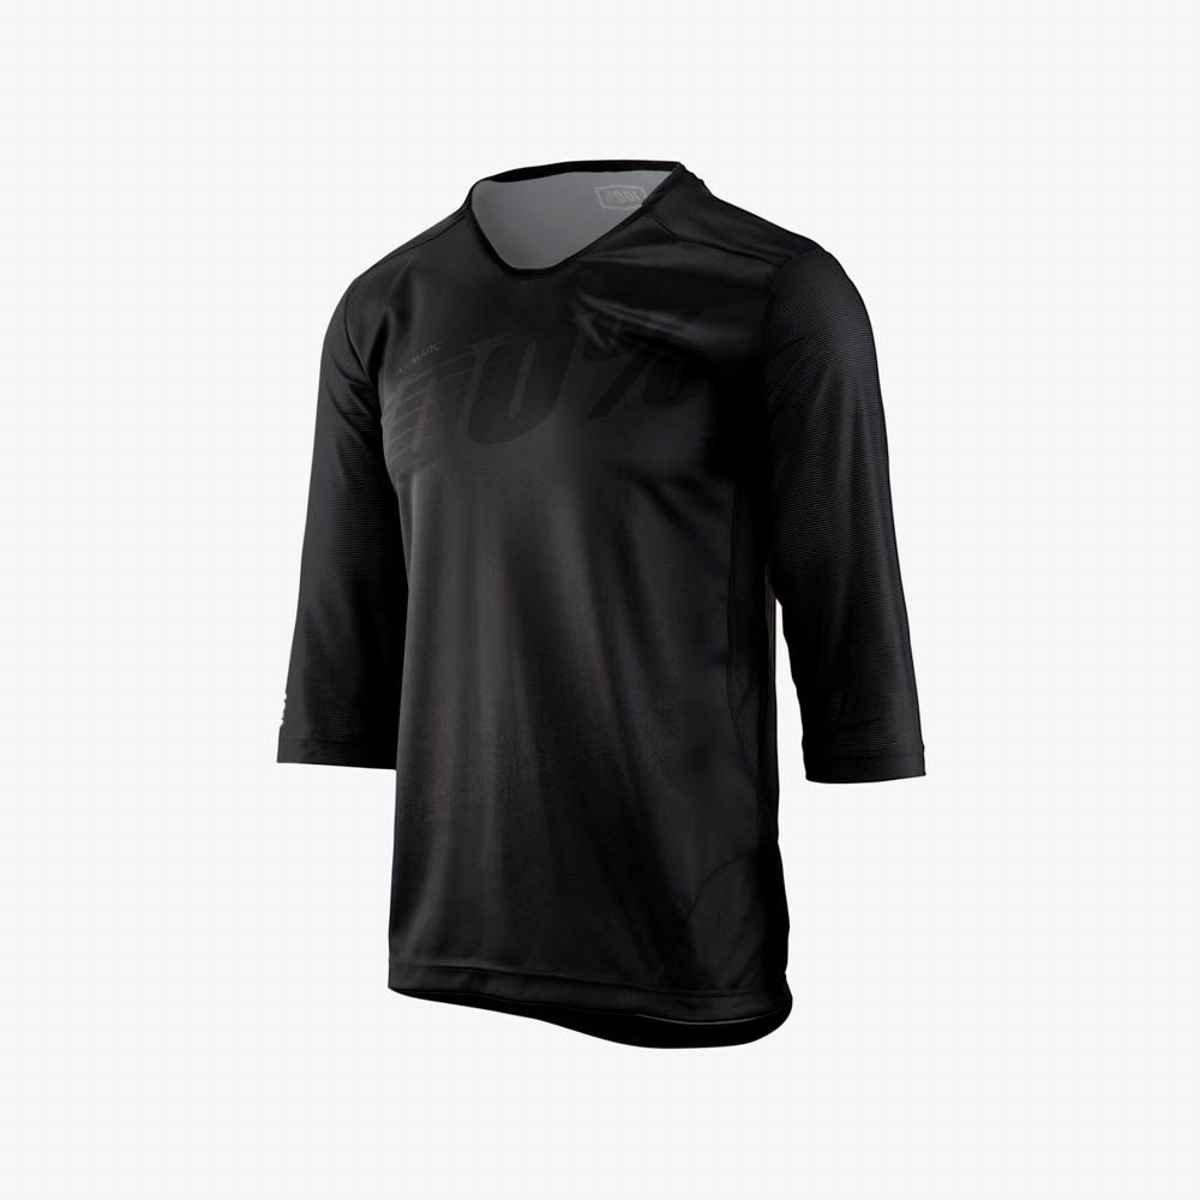 100 % AIRMATIC Jersey – Men 's B075NNMB61  Black 3/4 Medium